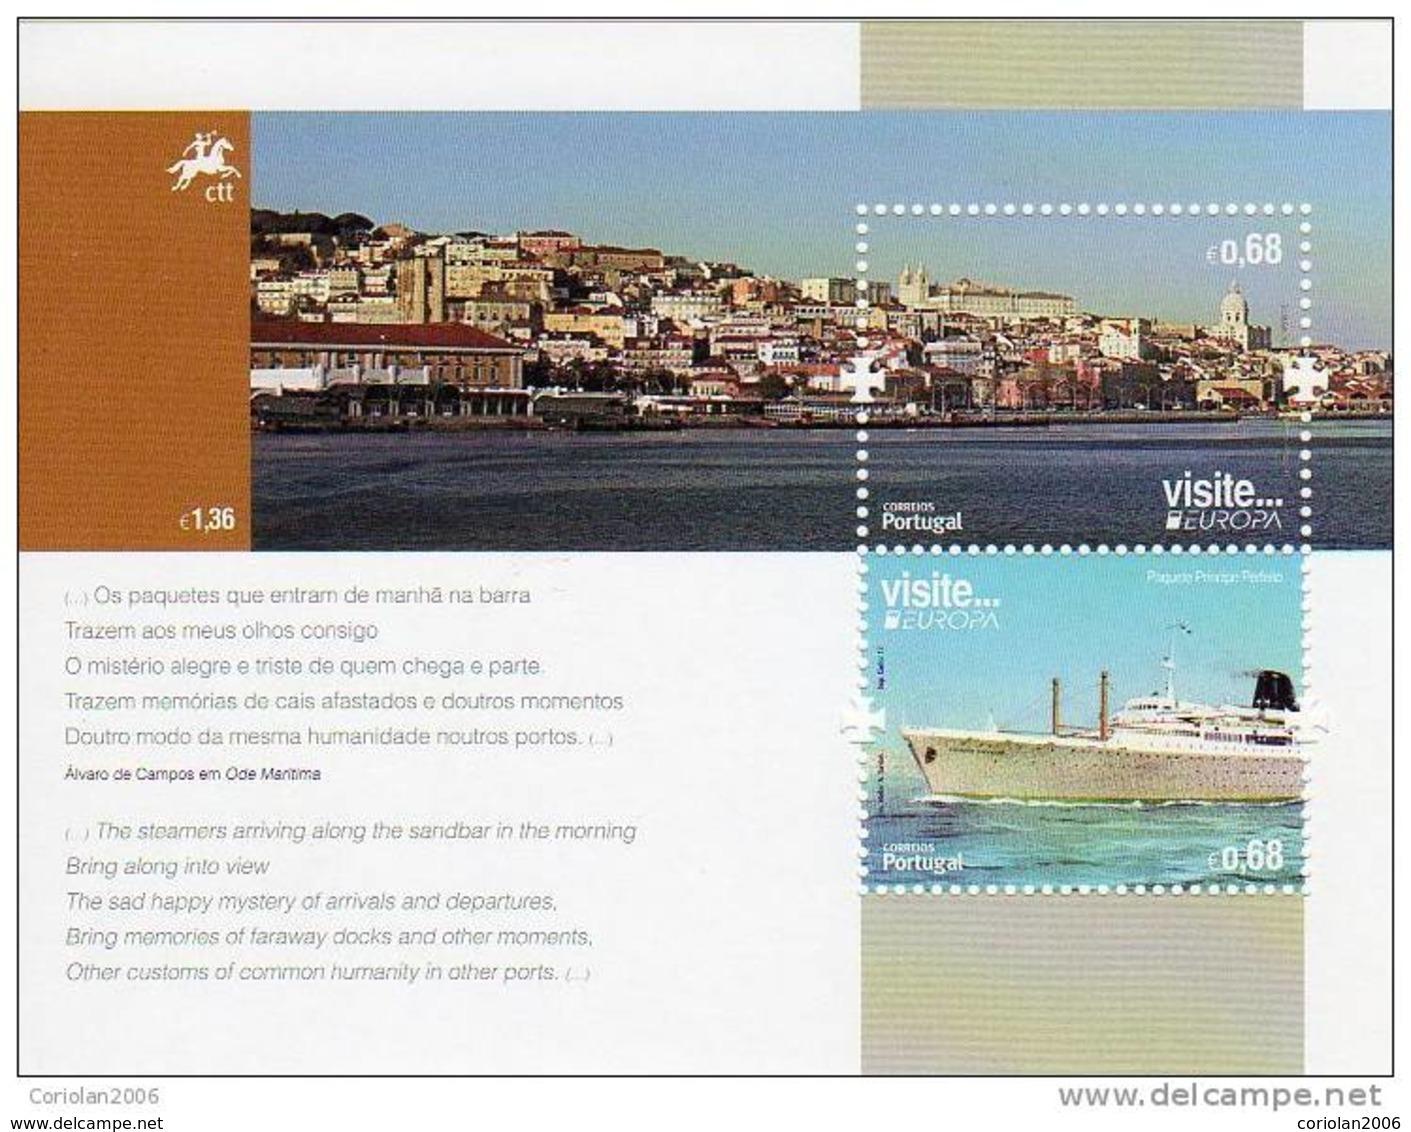 Portugal / Europa 2012 / S/S - 2012